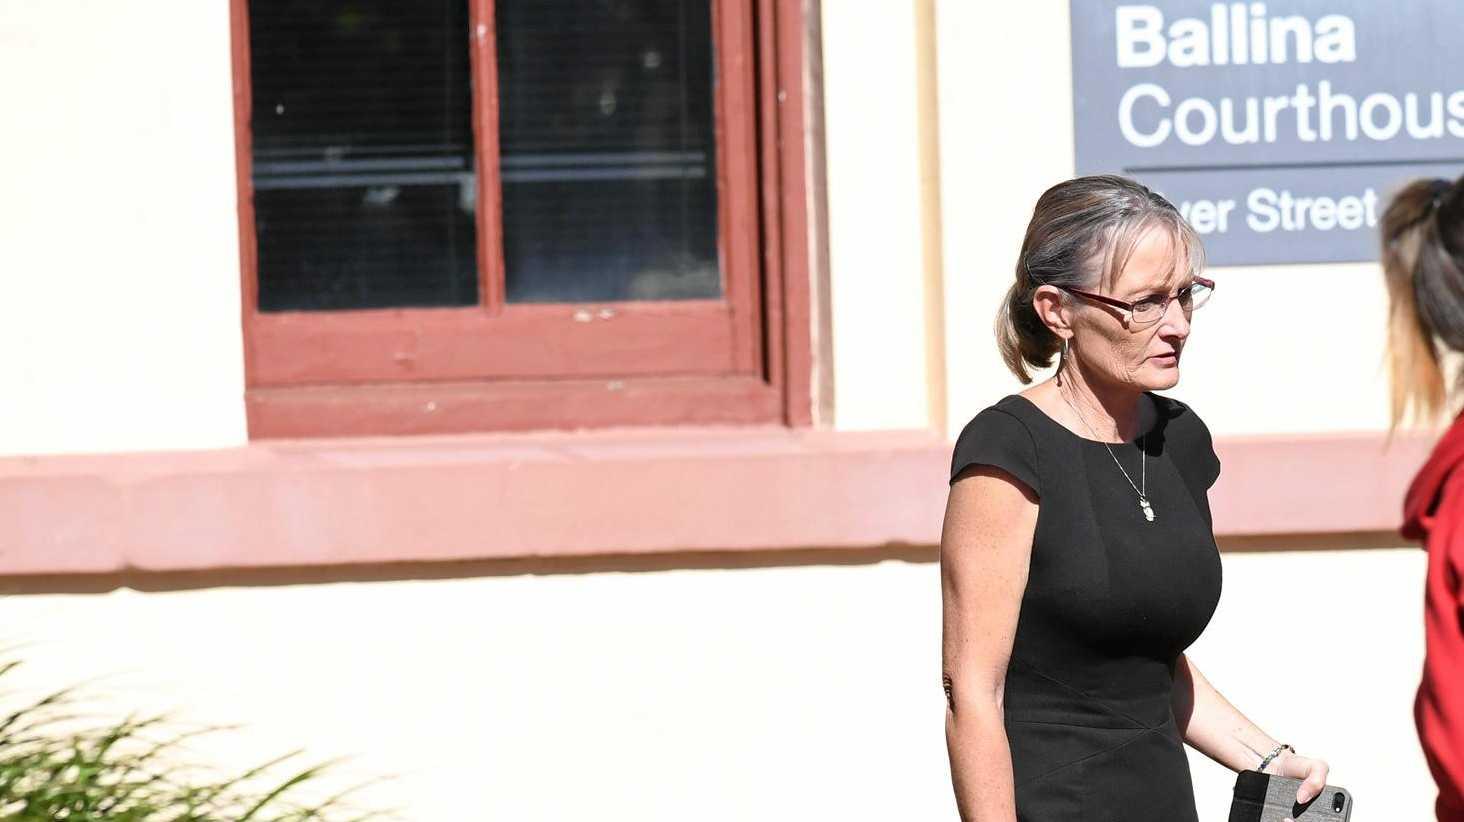 Alstonville woman Julianne Marree Butler, left, outside Ballina Court.